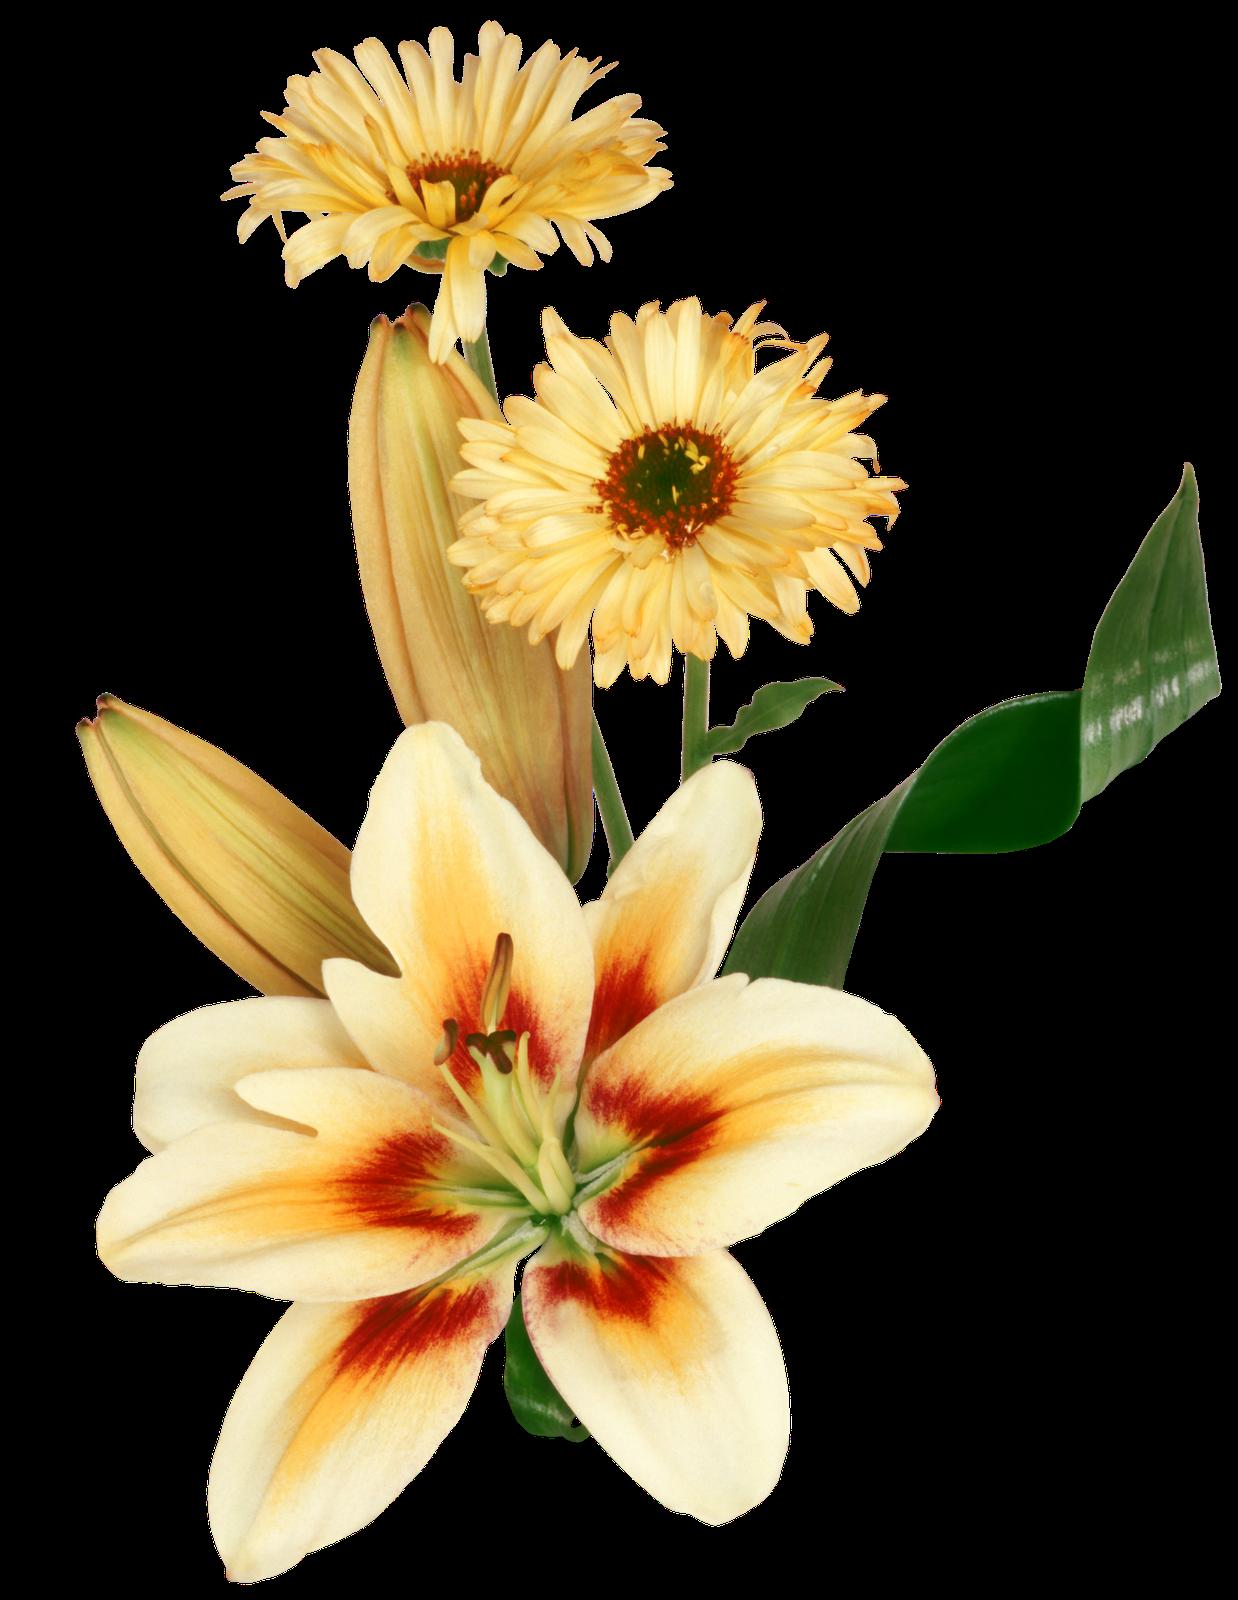 Pin De Anarh En Tatuajes Pinterest Mariposas Png Flores Y